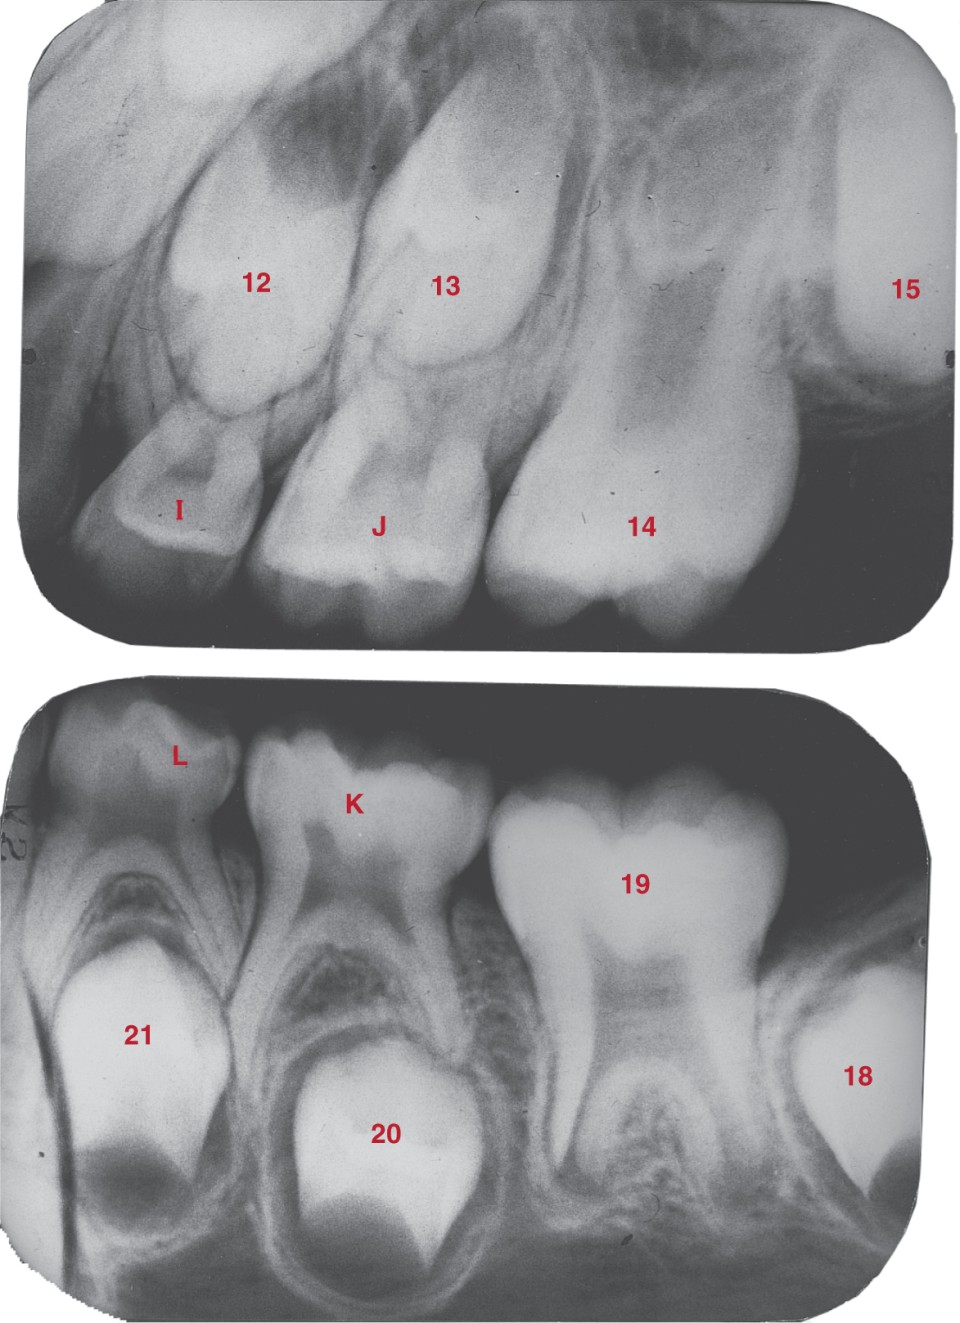 Two dental radiographs show maxillary and mandibular teeth.